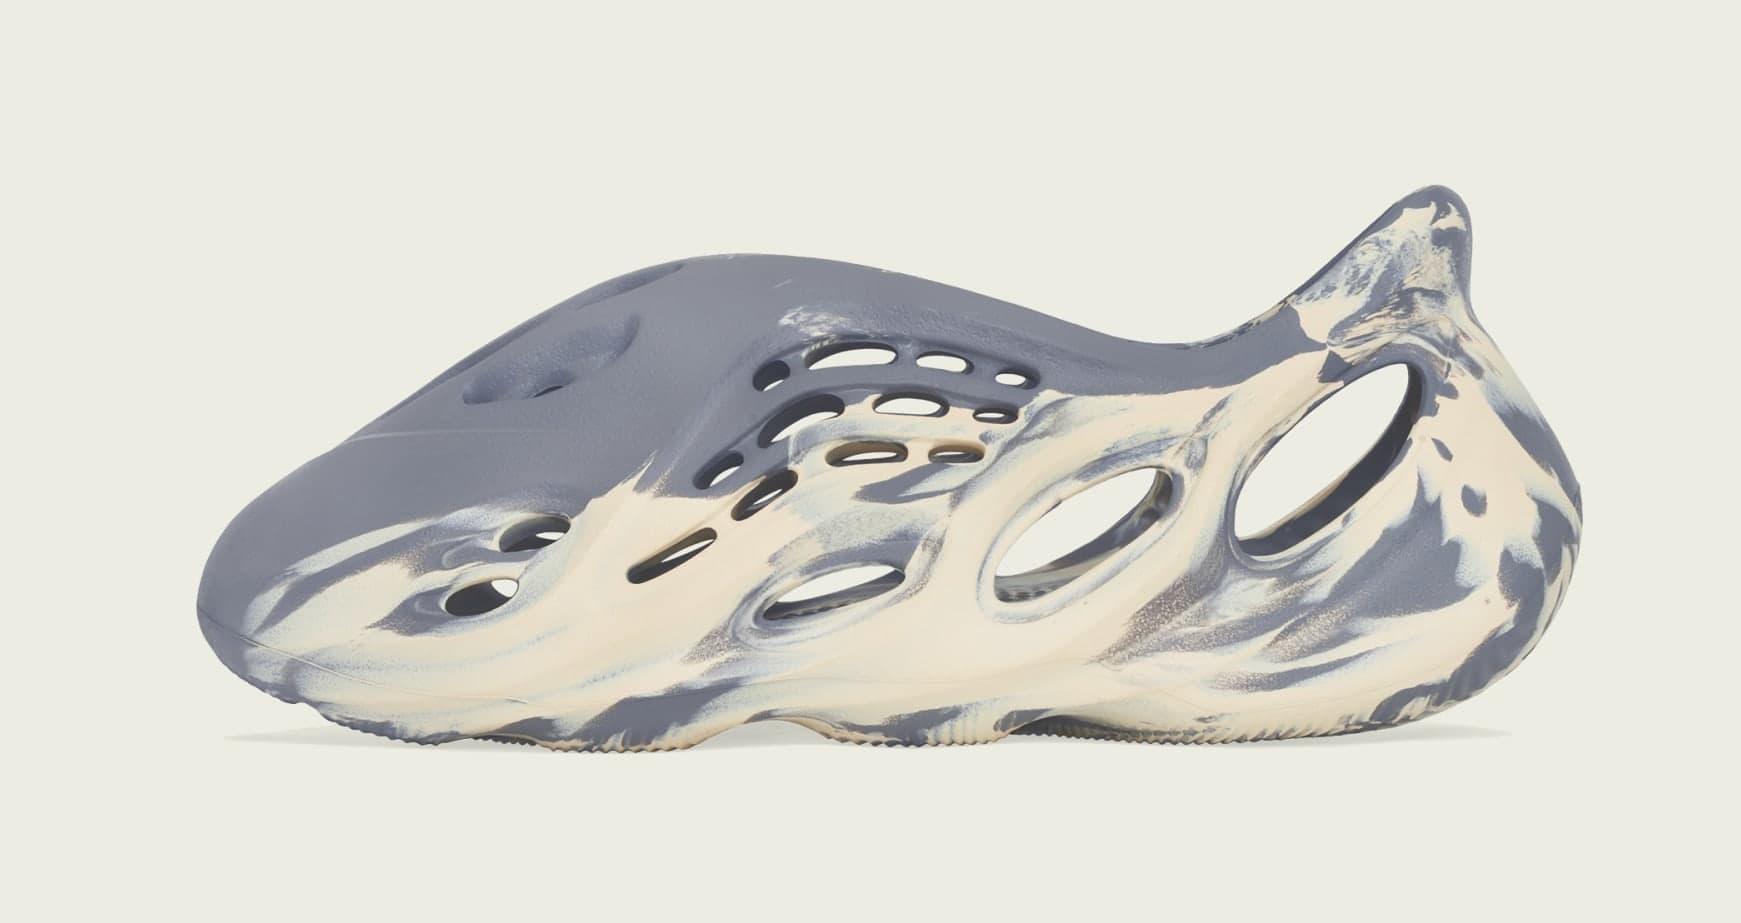 Adidas Yeezy Foam Runner 'Mxt Moon Gray' GV7904 Lateral